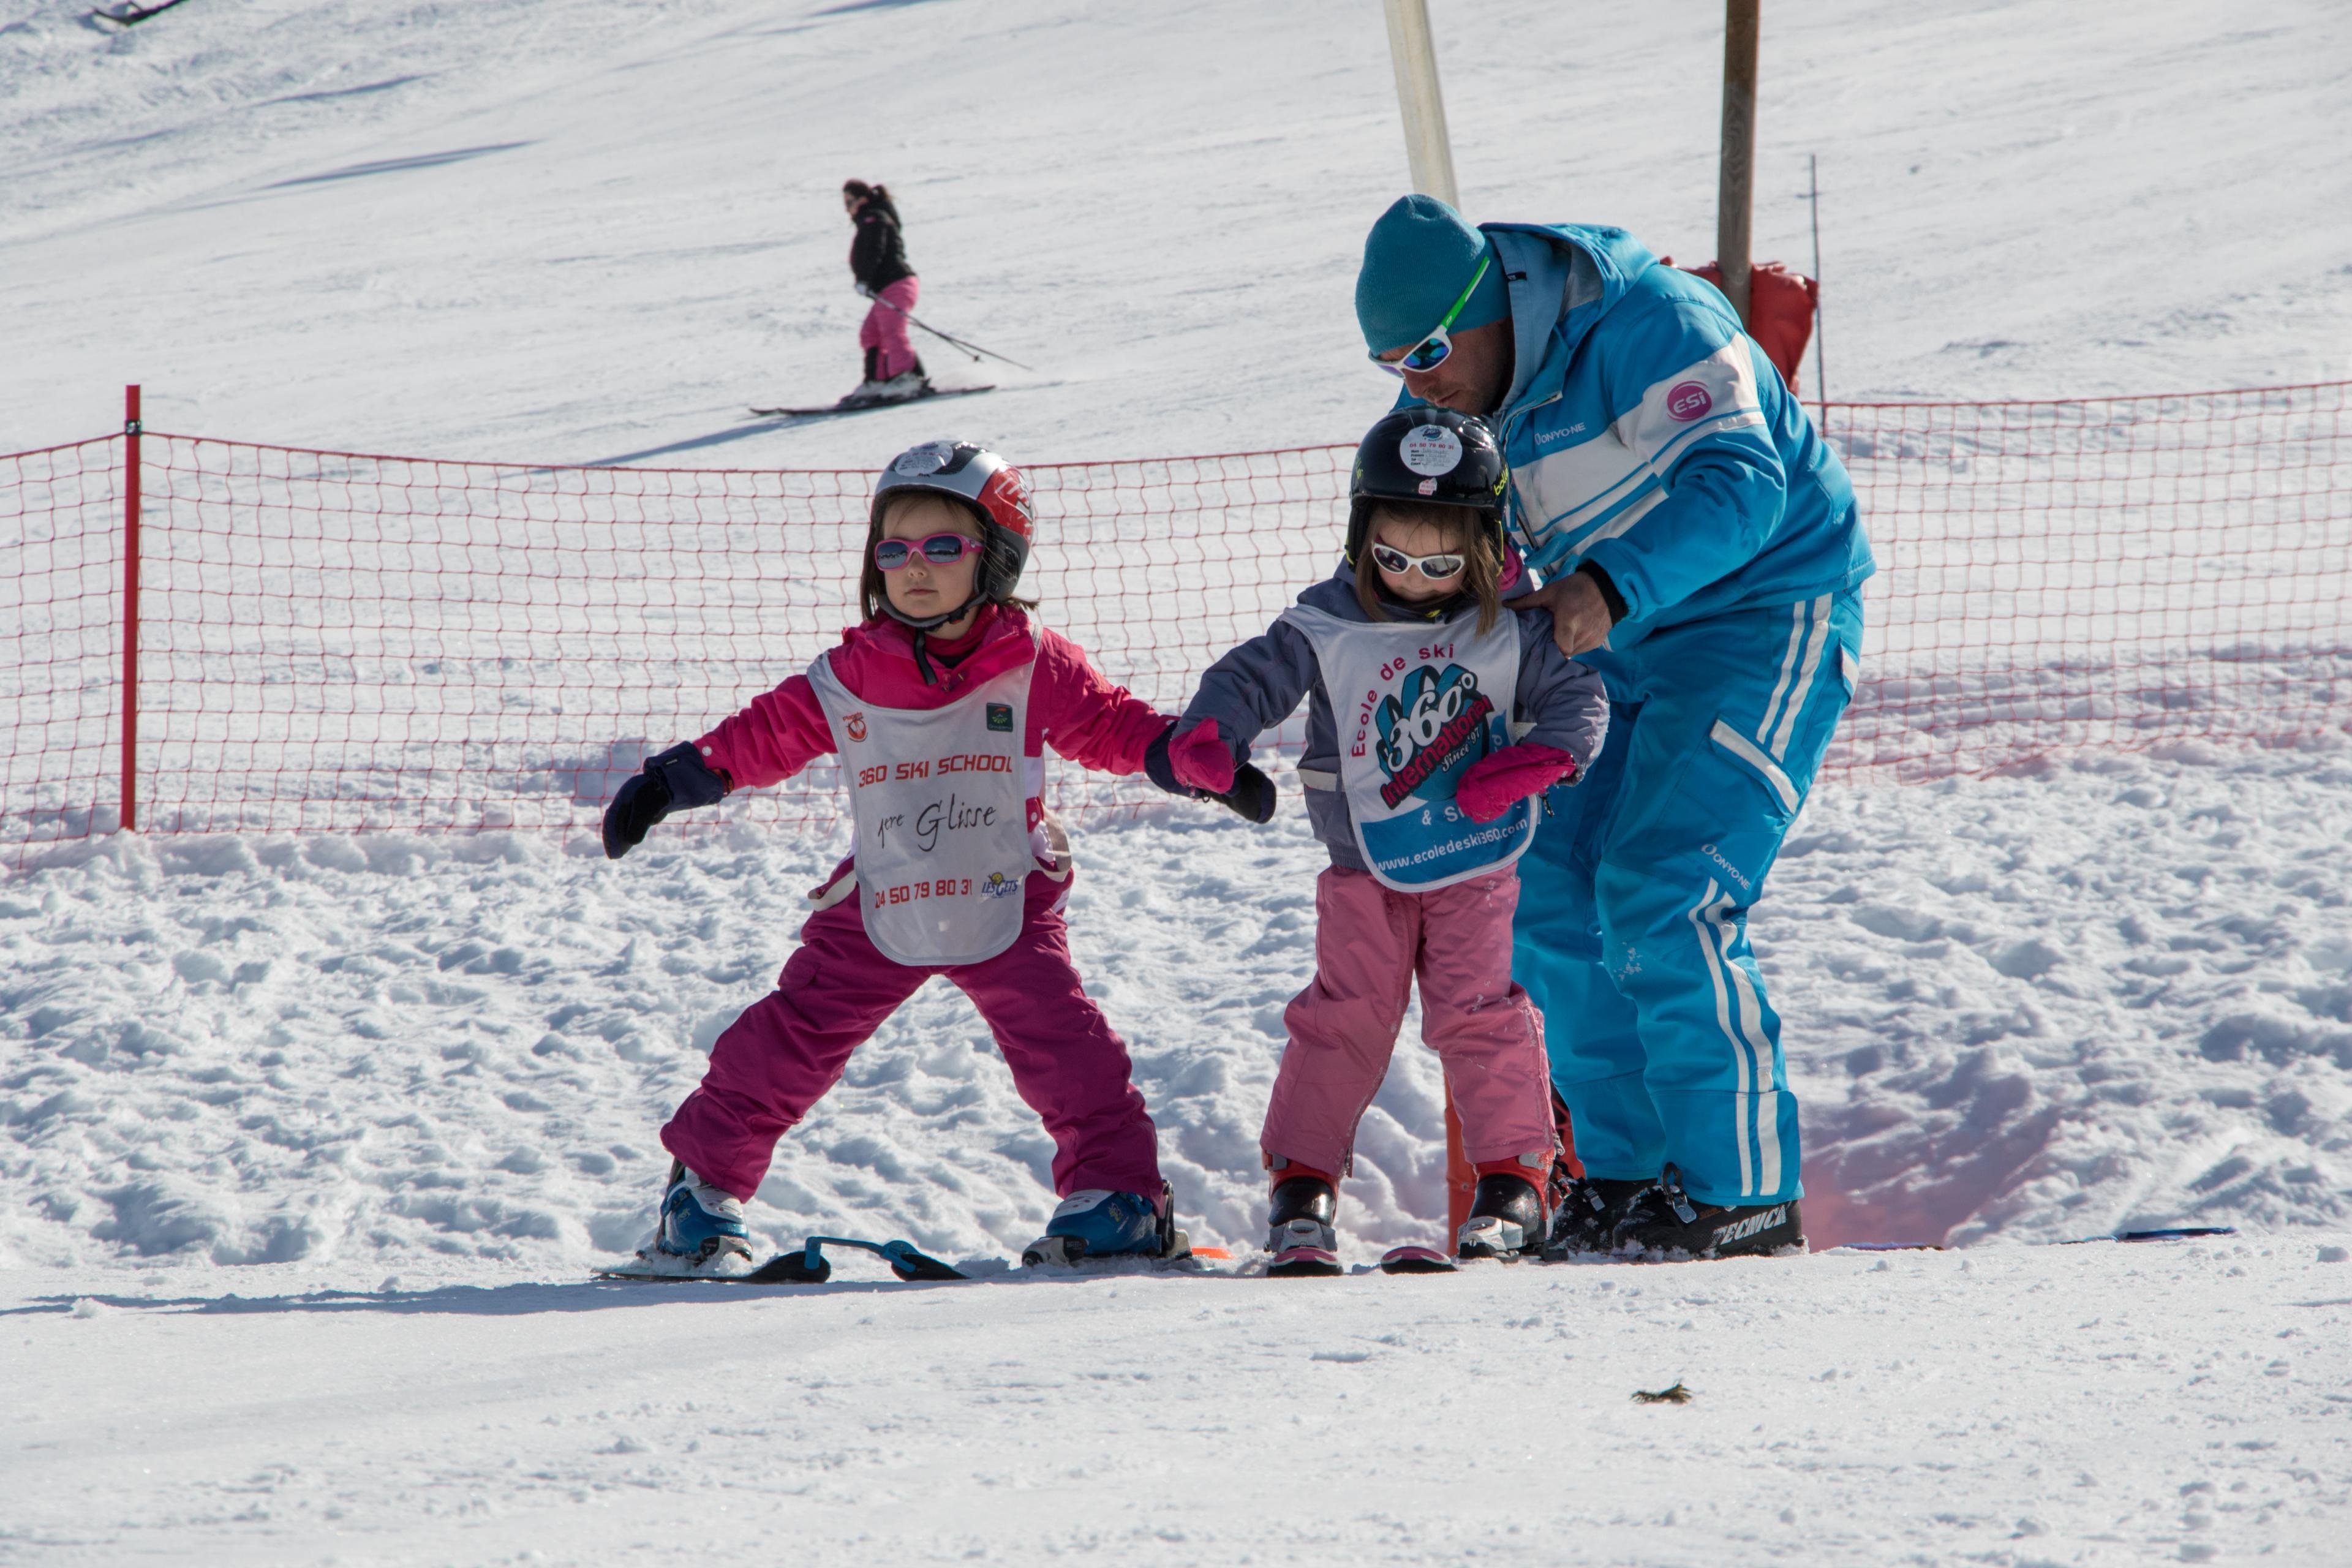 Ski Lessons for Kids (4-8 years) - Low Season